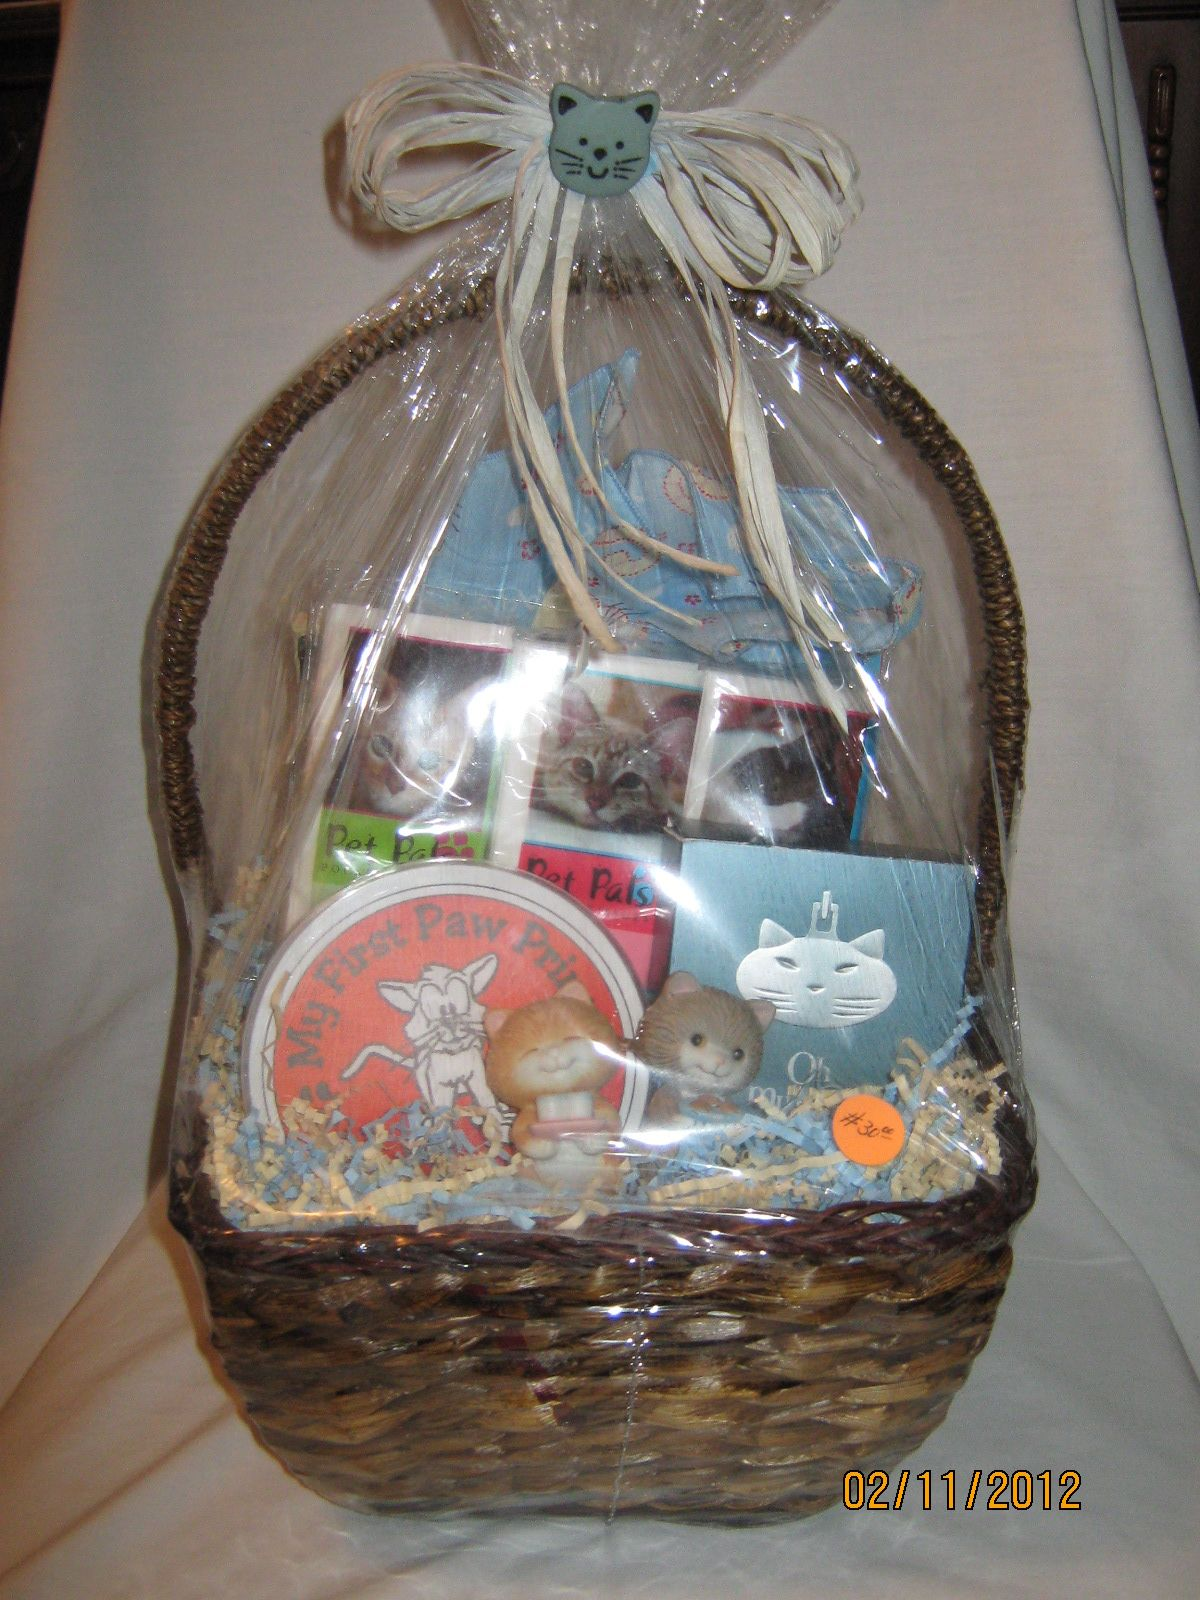 New Kitten Gift Basket Kittens Gifts Gift Baskets Basket